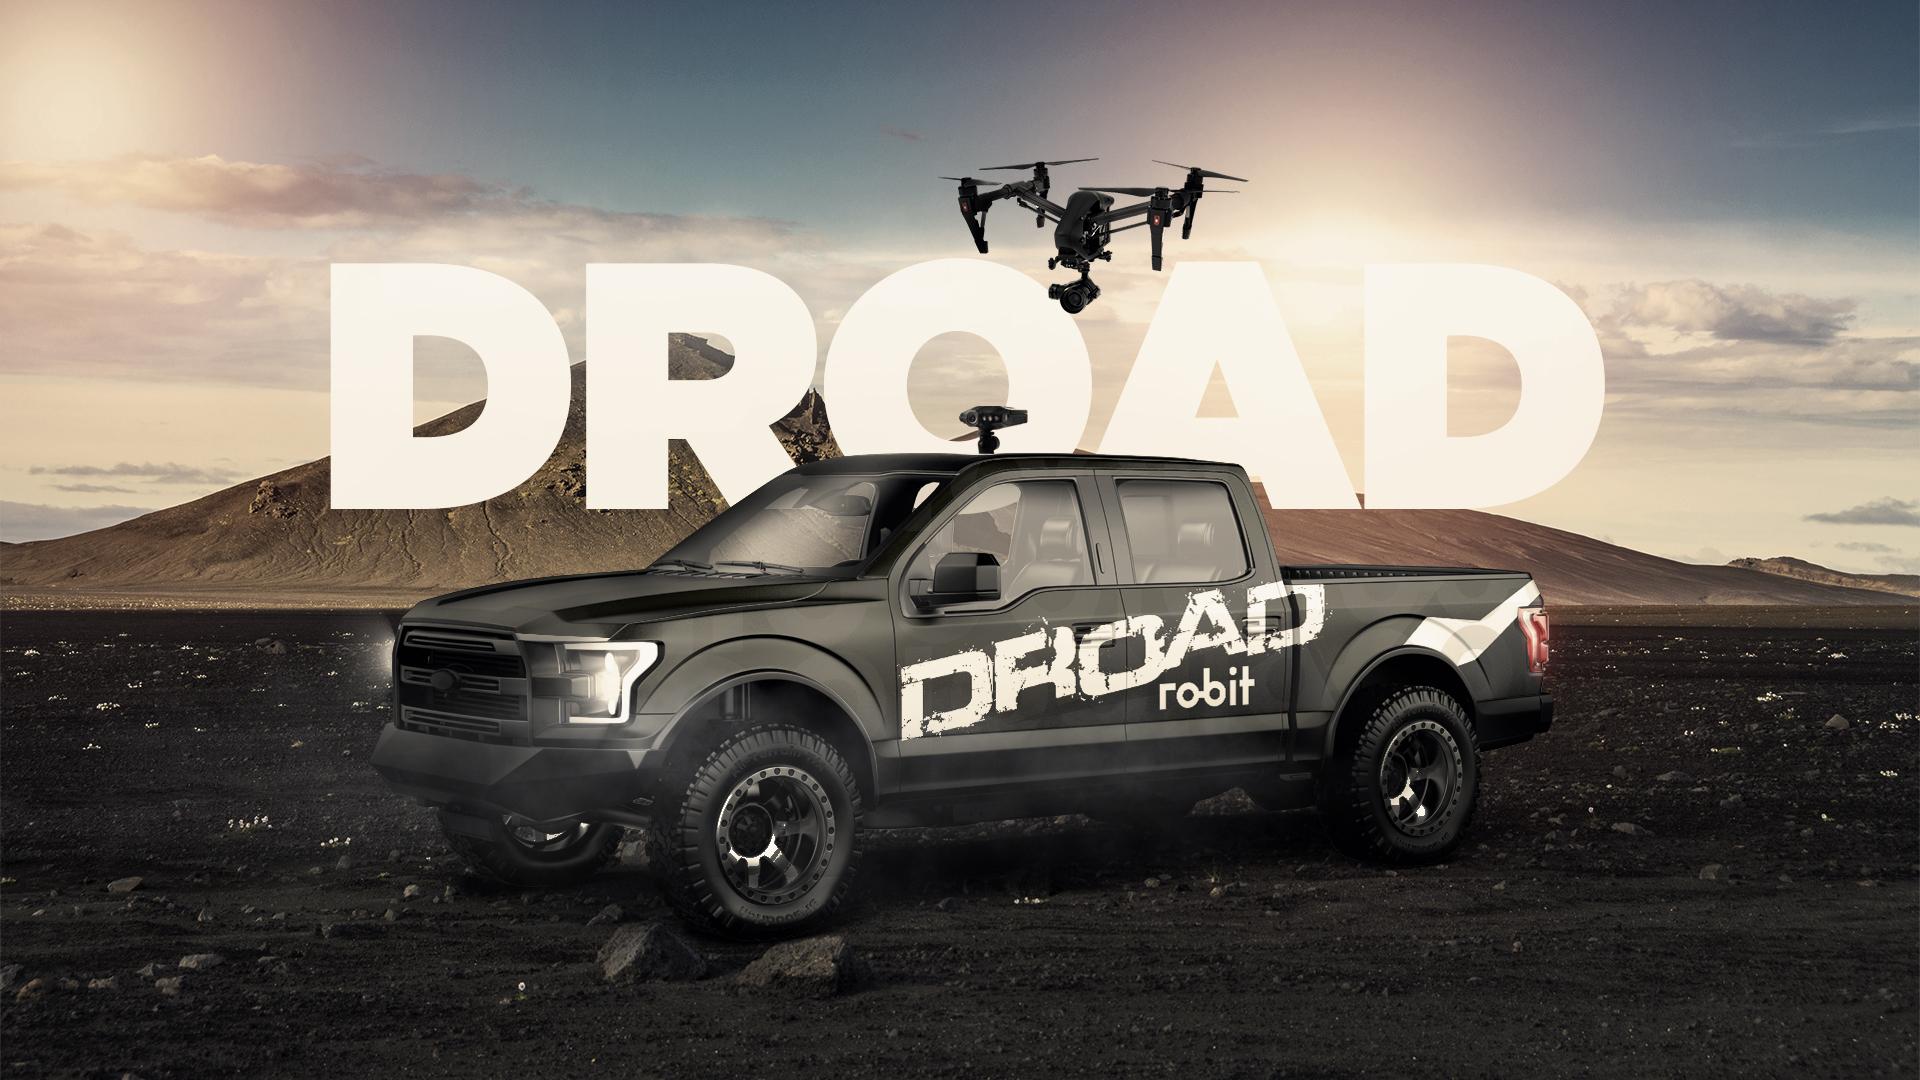 DROAD - Sınırın Mobil Bekçisi